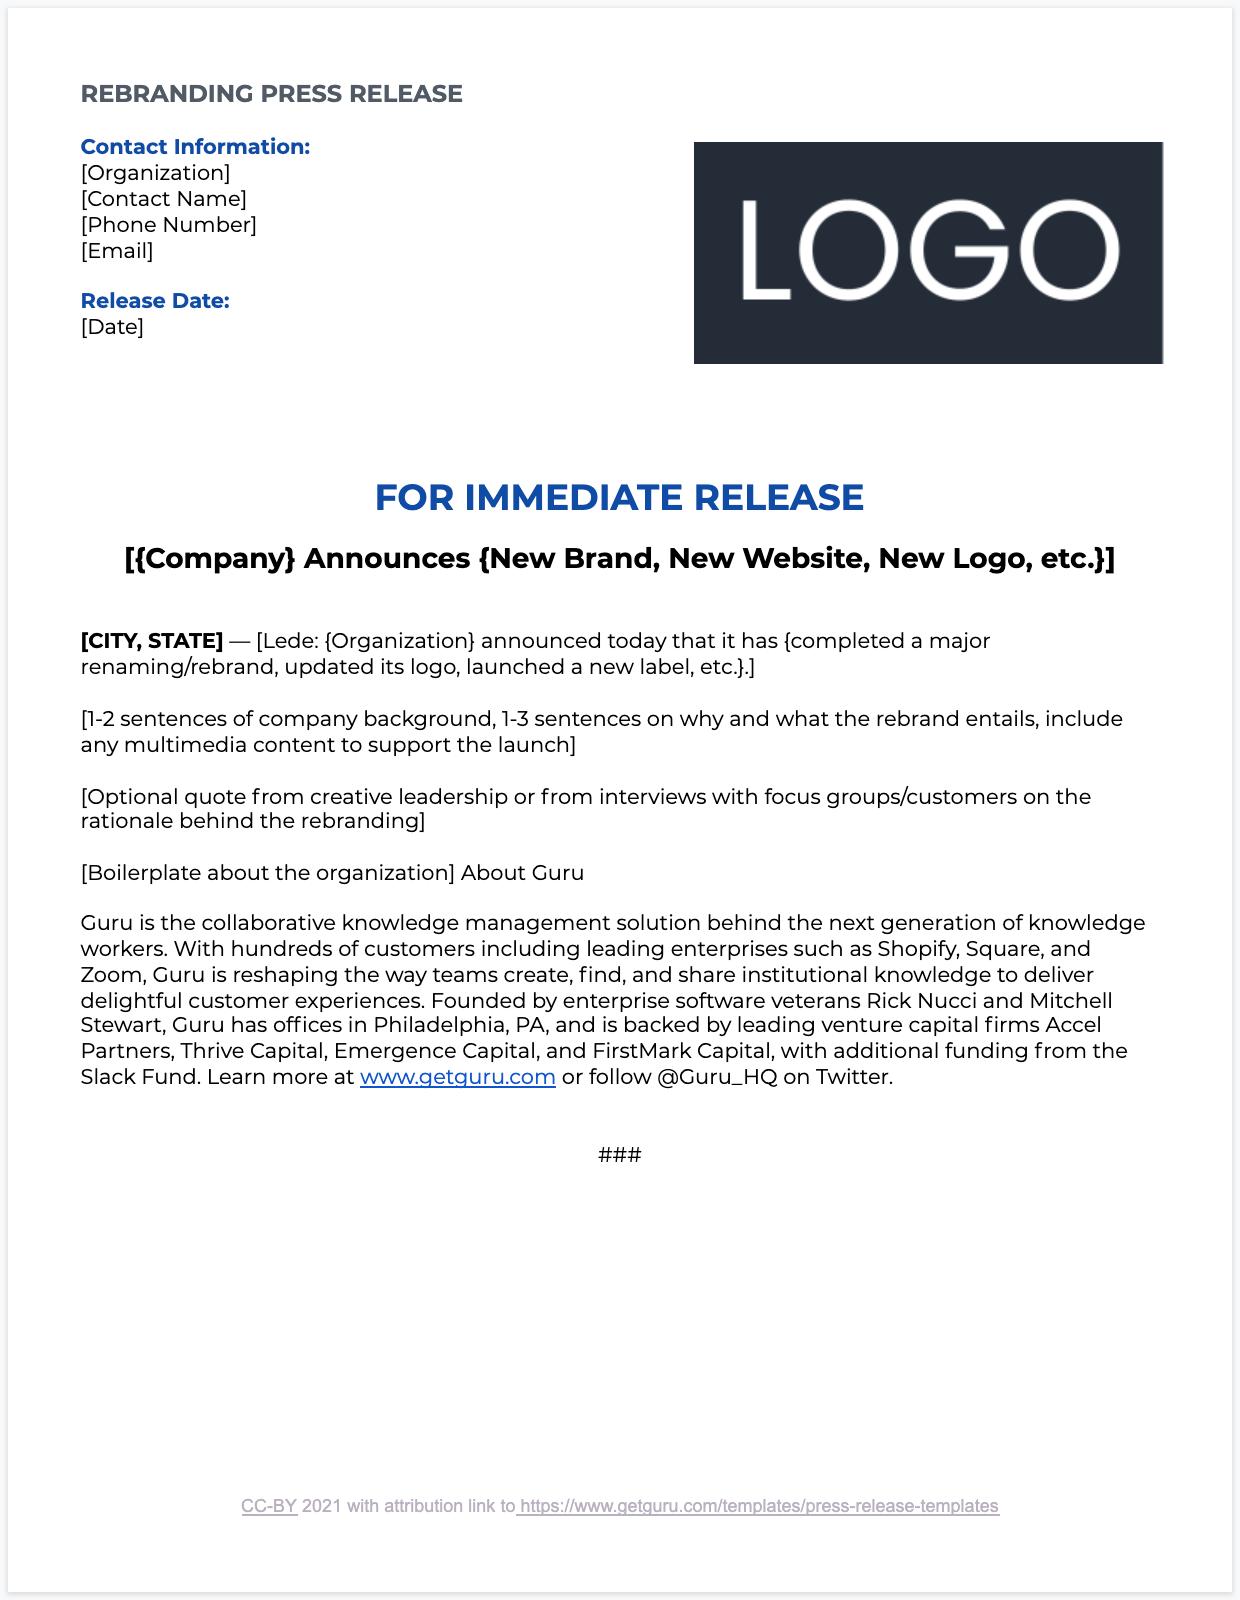 Rebranding Press Release Overview